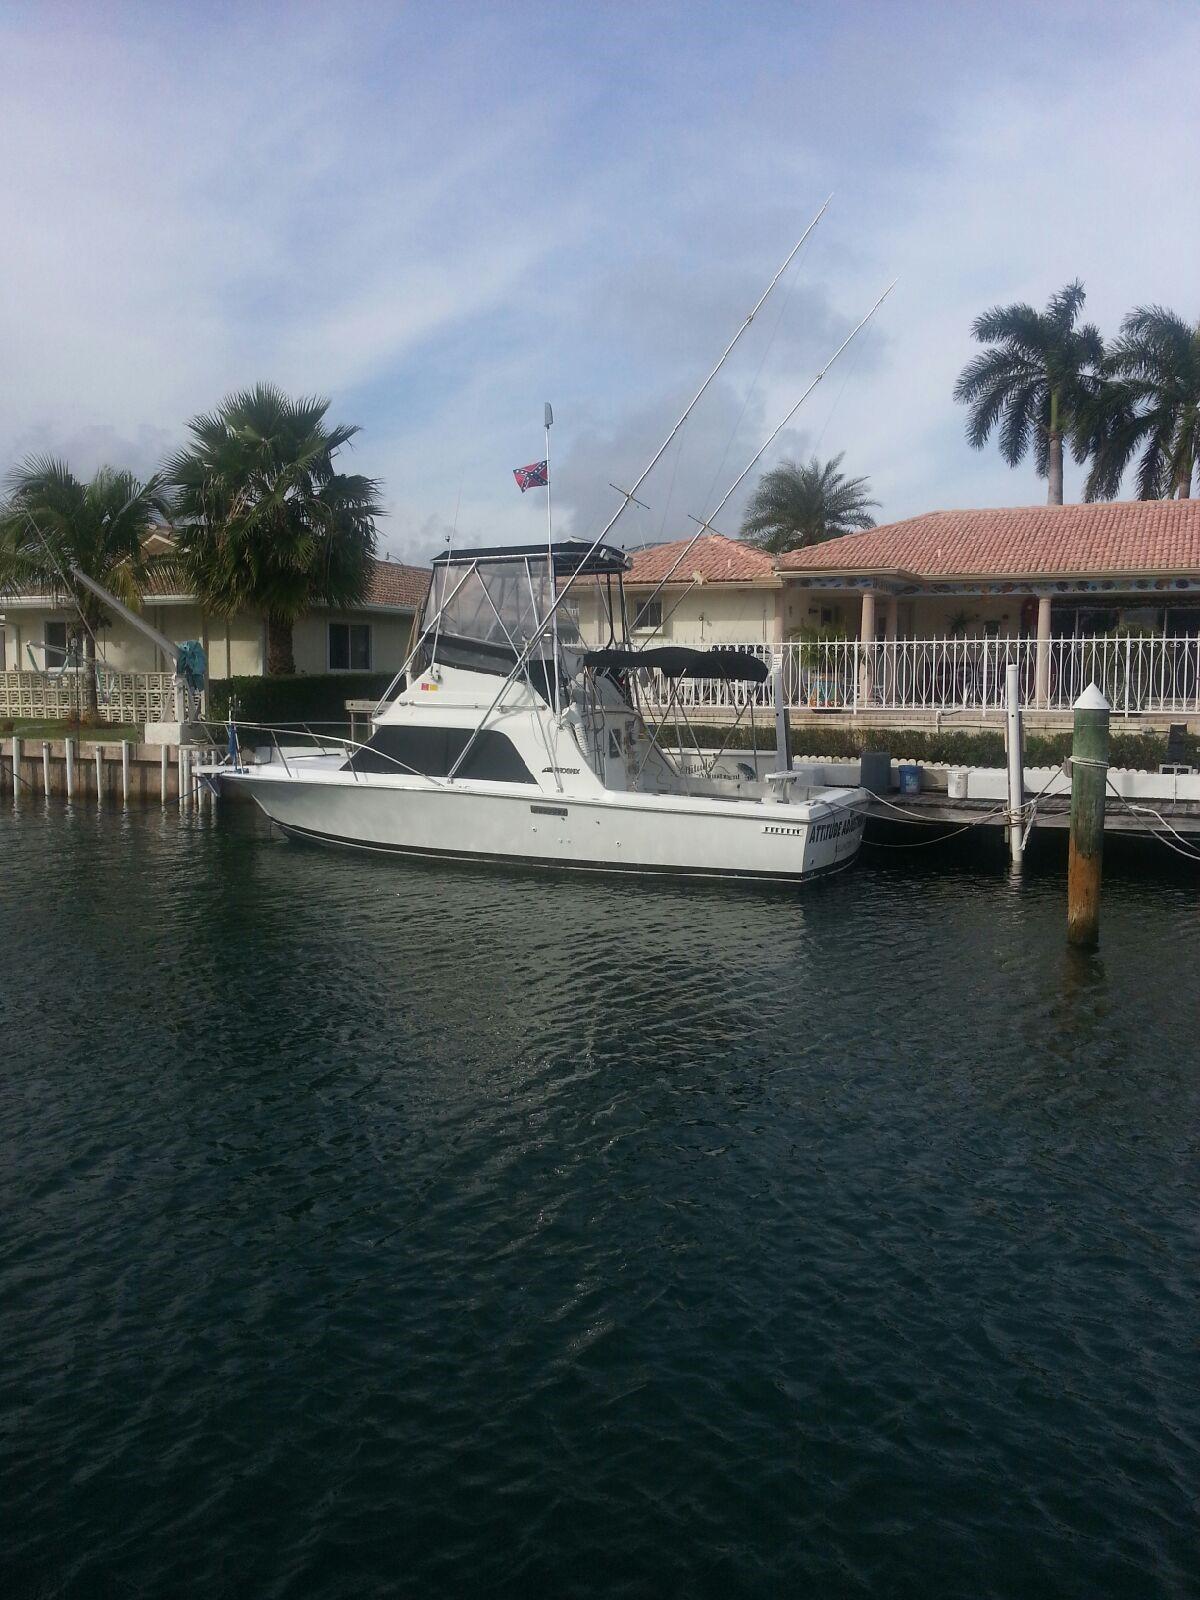 1985 used phoenix sportfish sports fishing boat for sale for Fishing in phoenix arizona